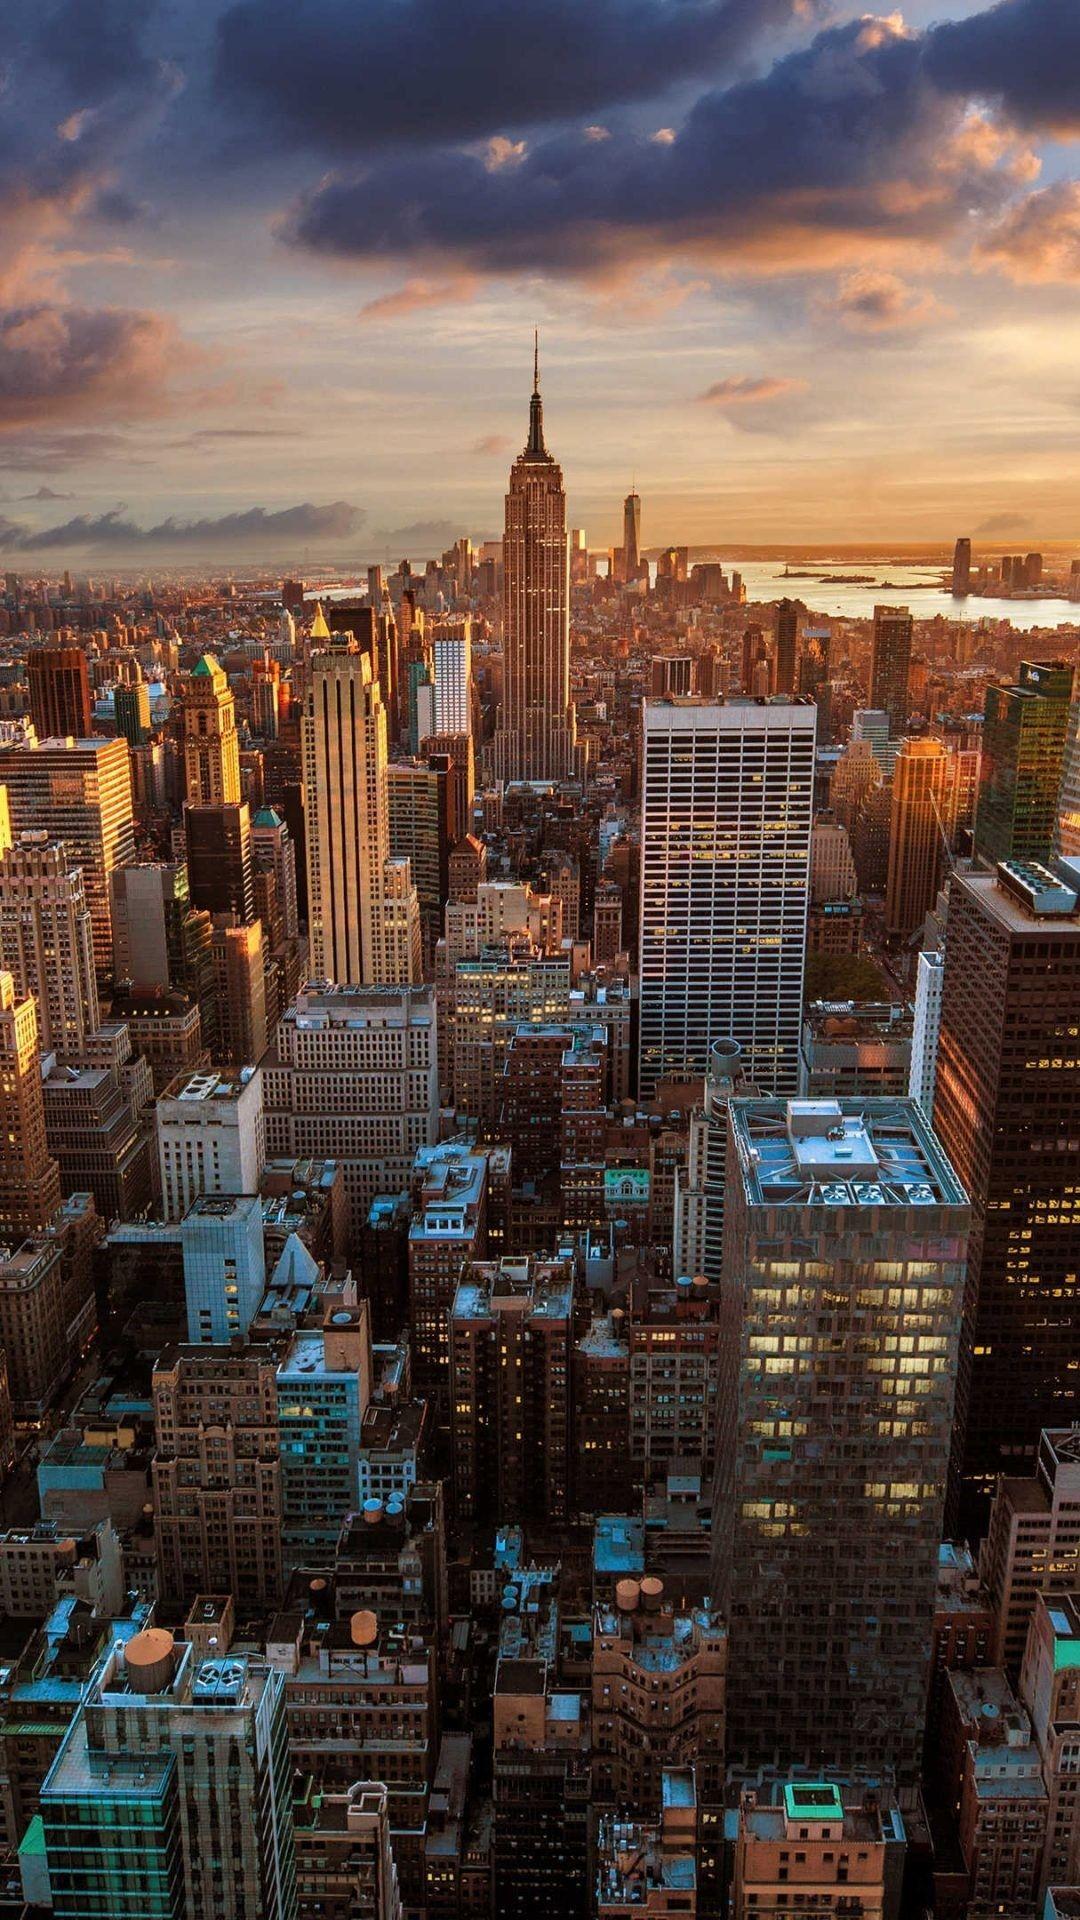 1080x1920 New York City 4k Wallpaper 38 Images New York Wallpaper City Wallpaper City Aesthetic